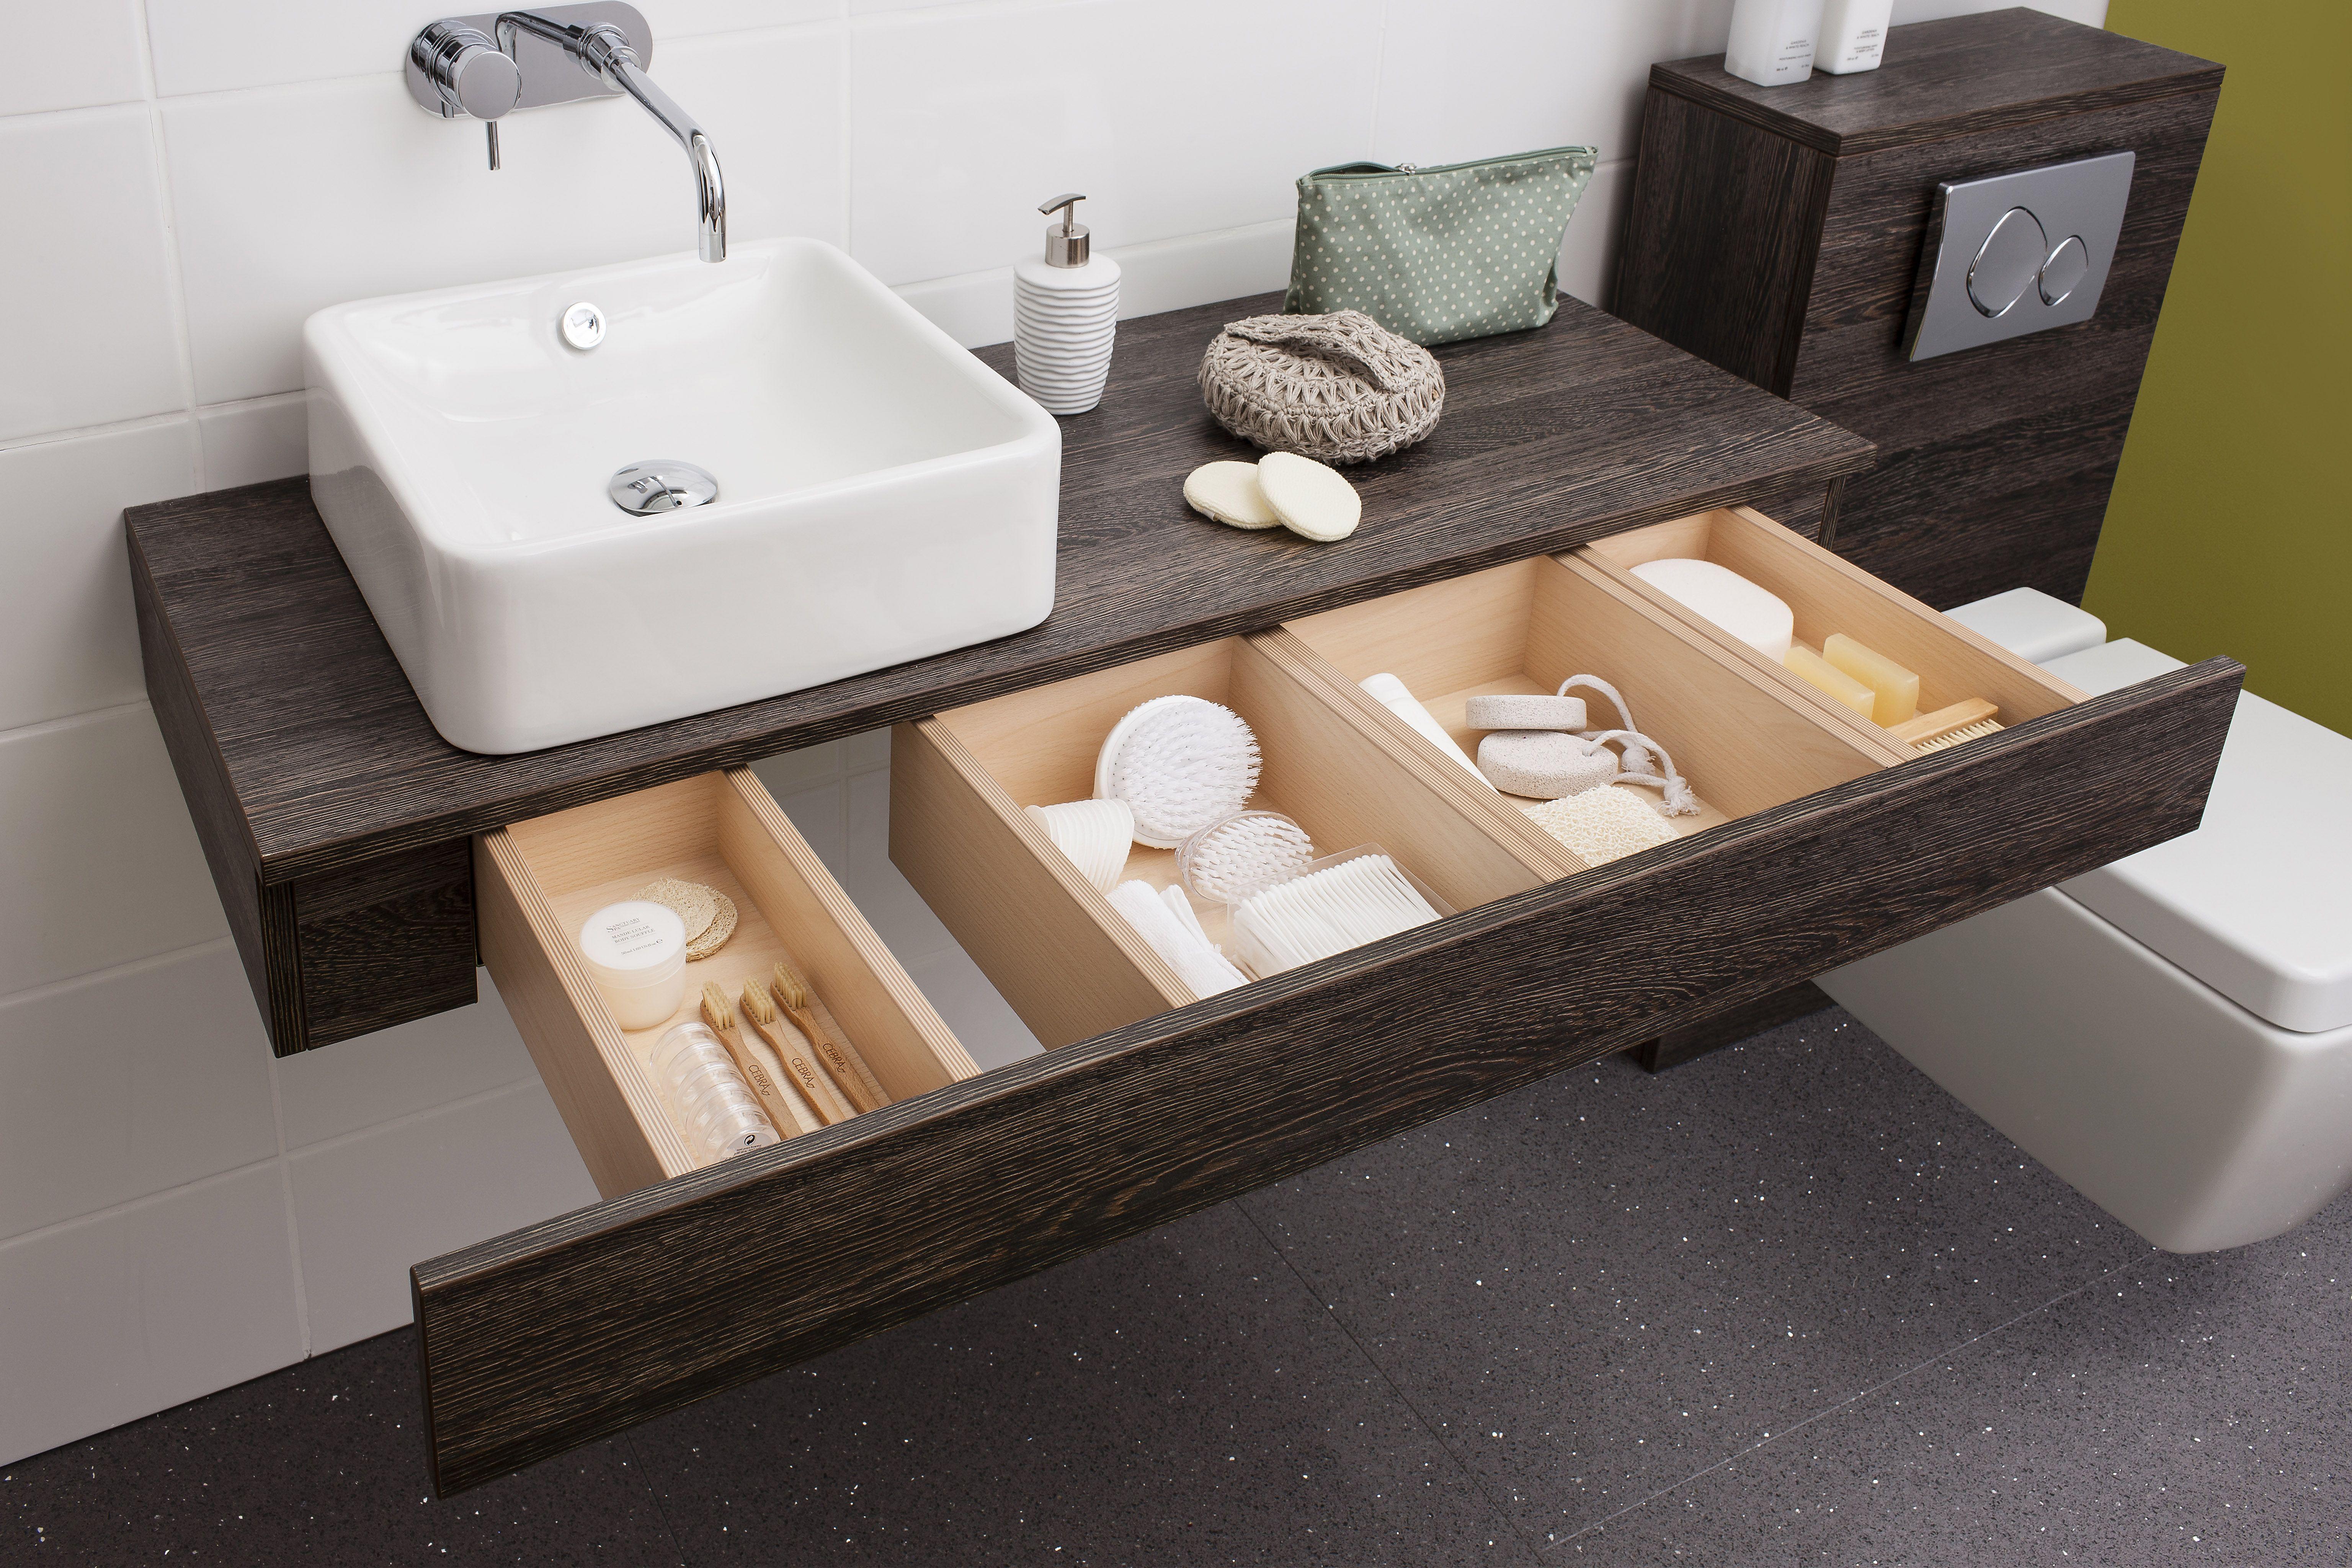 Edge Ebony Bathroom Furniture Range From Crosswater Http Www Bauhaus Bathrooms Co Uk Category Bauhaus Furniture Edge Bauhaus Mobel Ebenholz Luxus Badezimmer